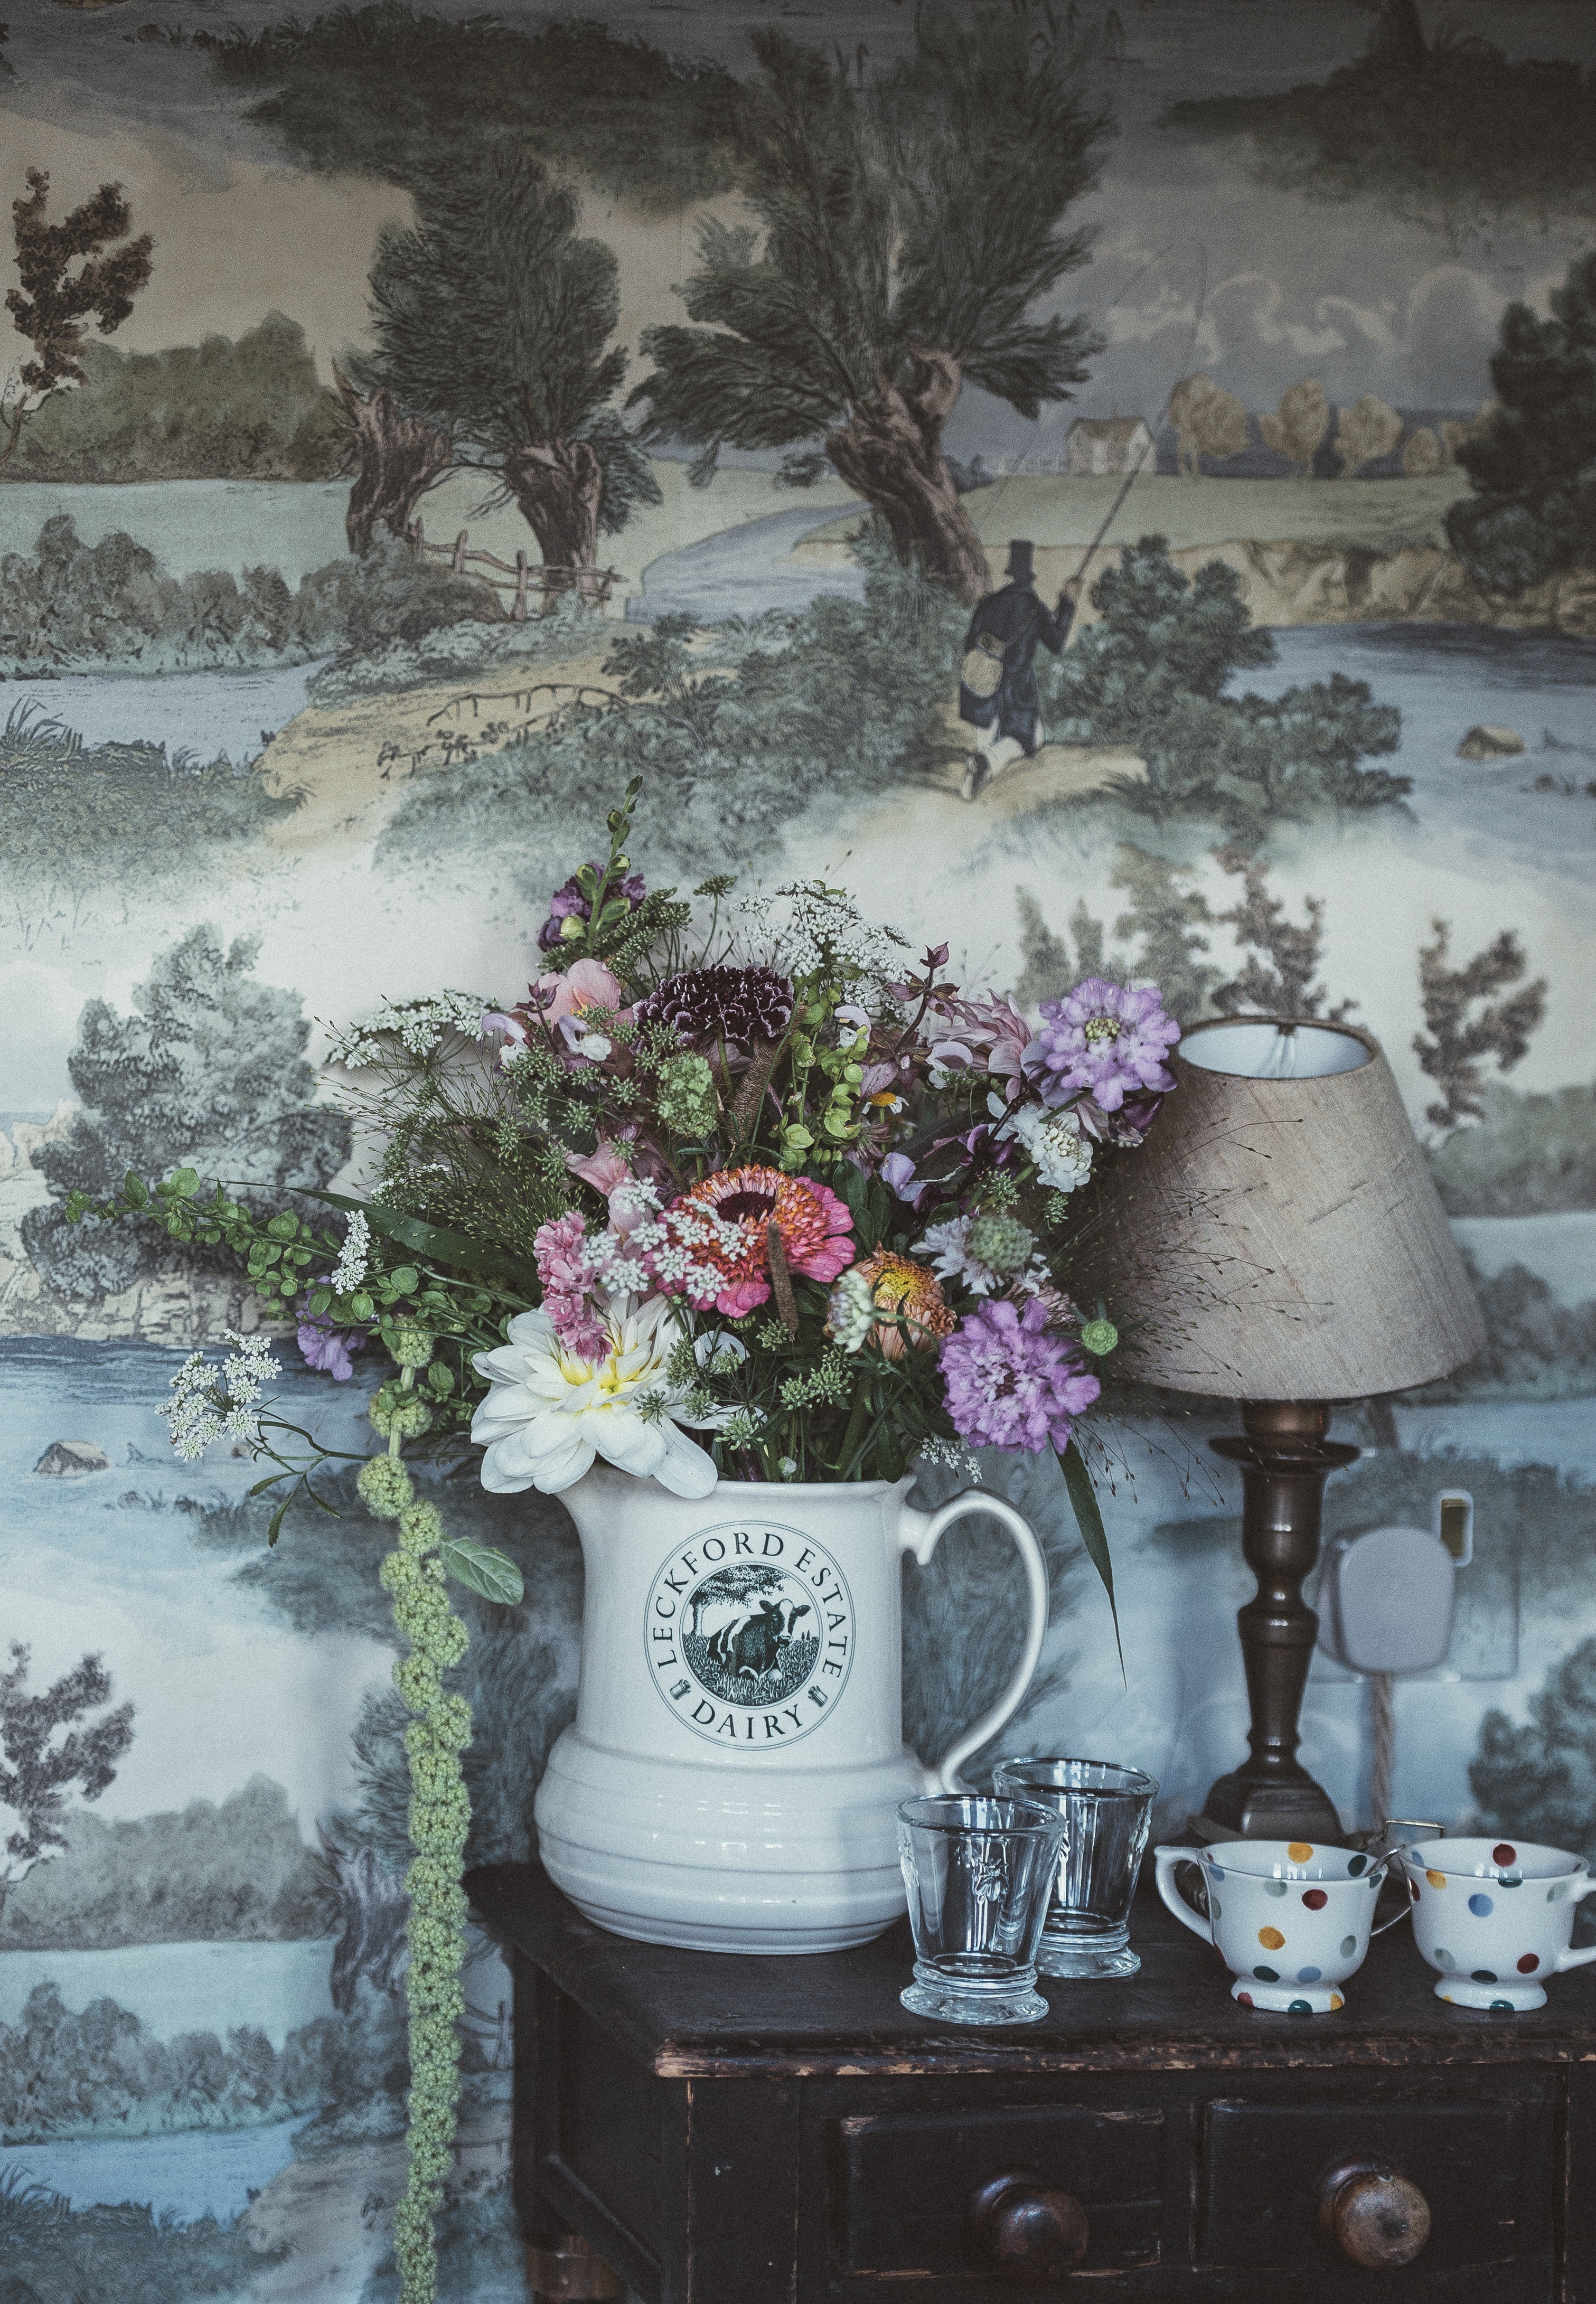 vase of flowers in front of vintage wallpaper